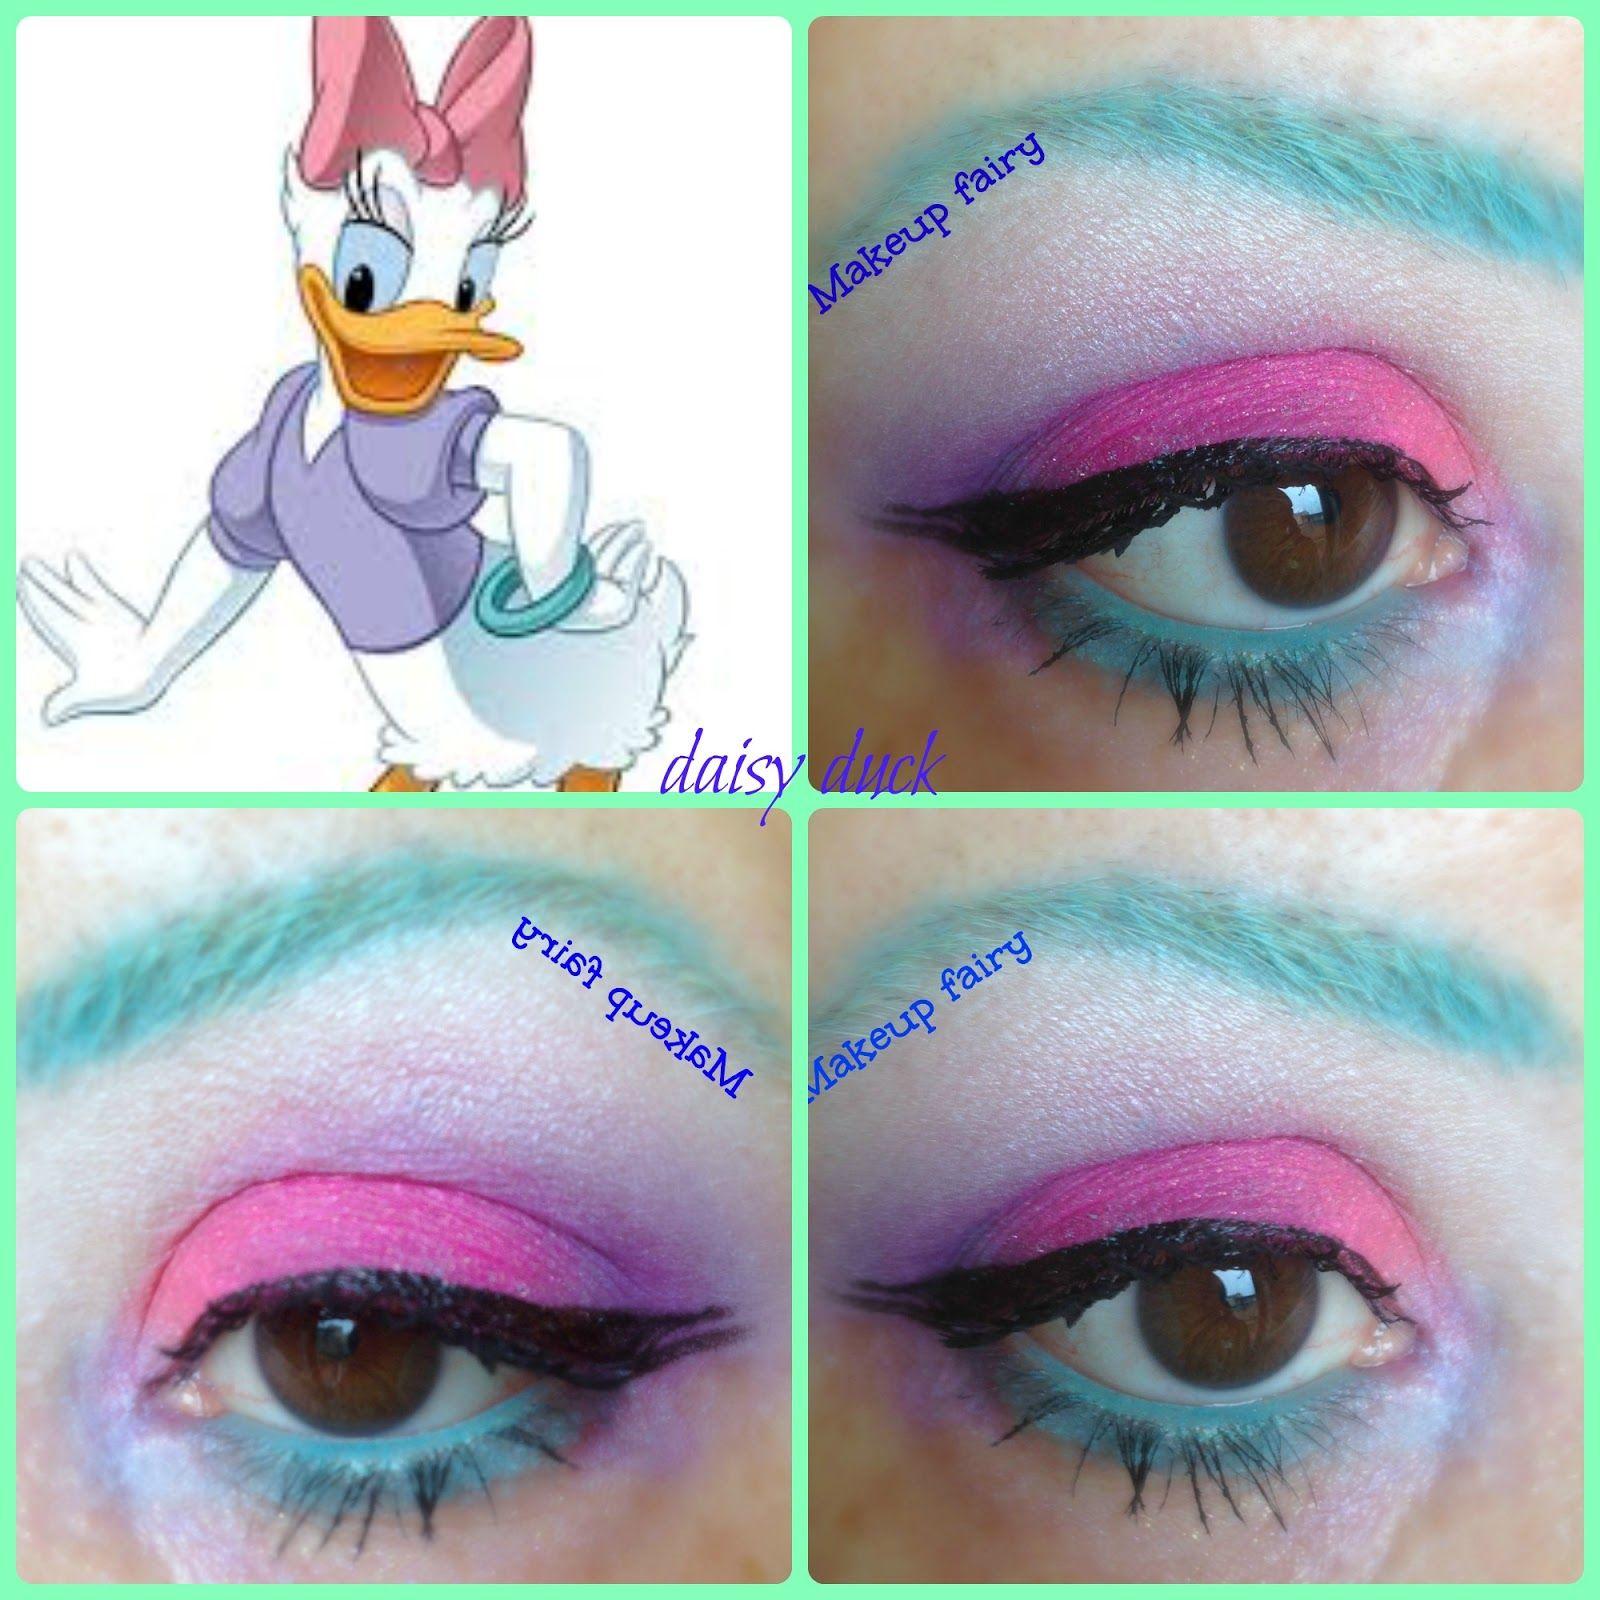 daisy duck eye makeup Google Search Daisy duck costume